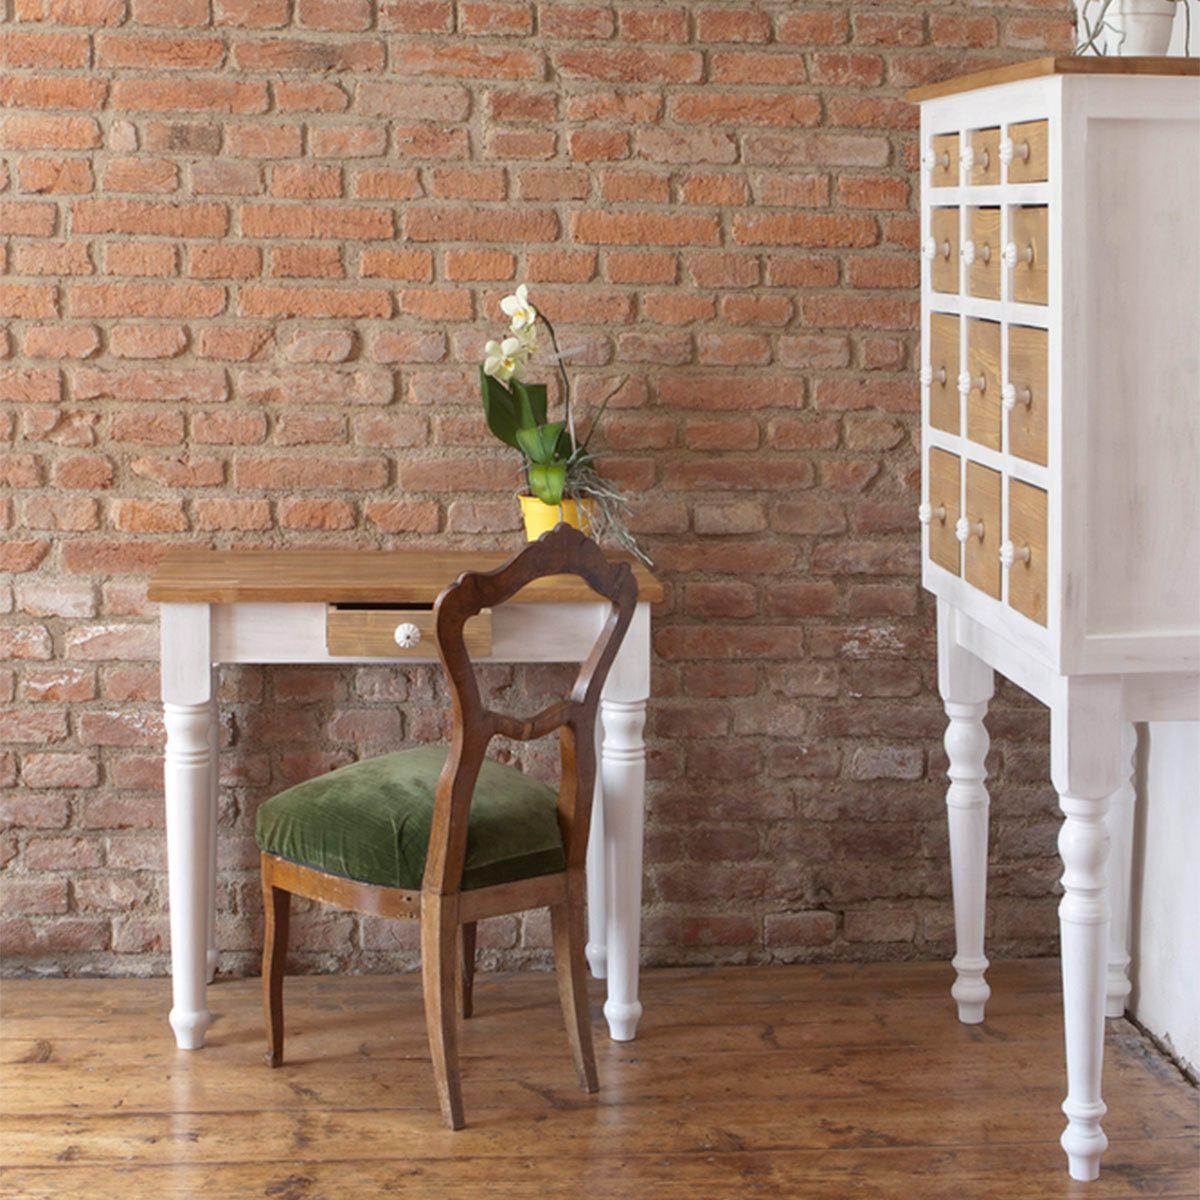 Farmhouse Look: Painted Furniture